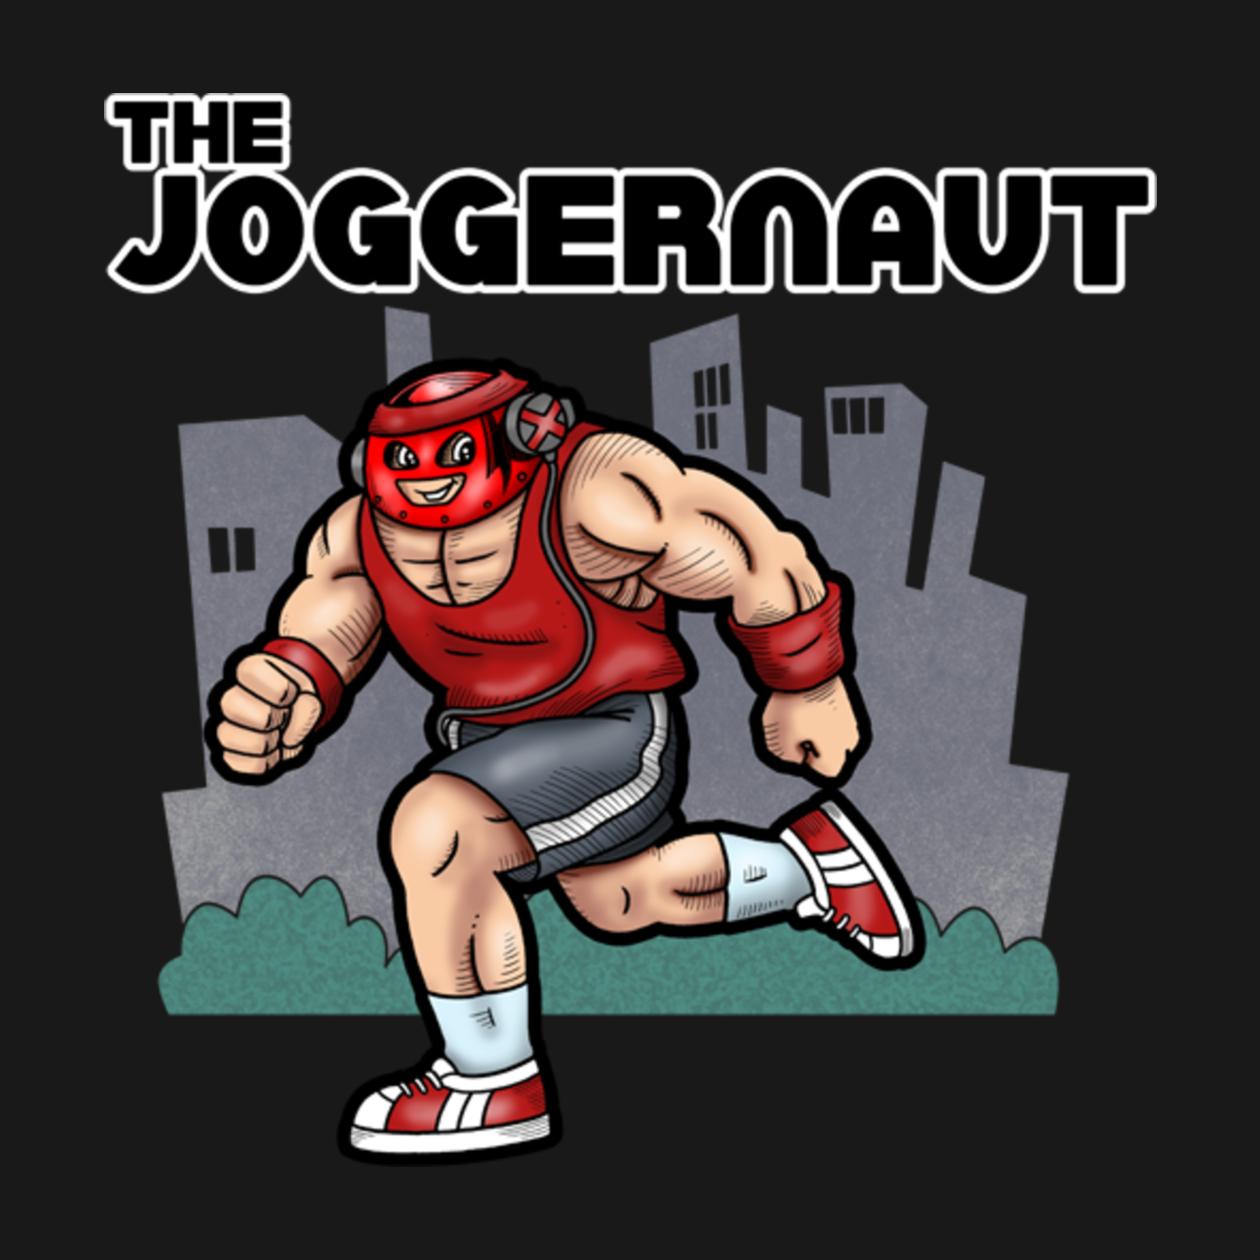 joggernaut